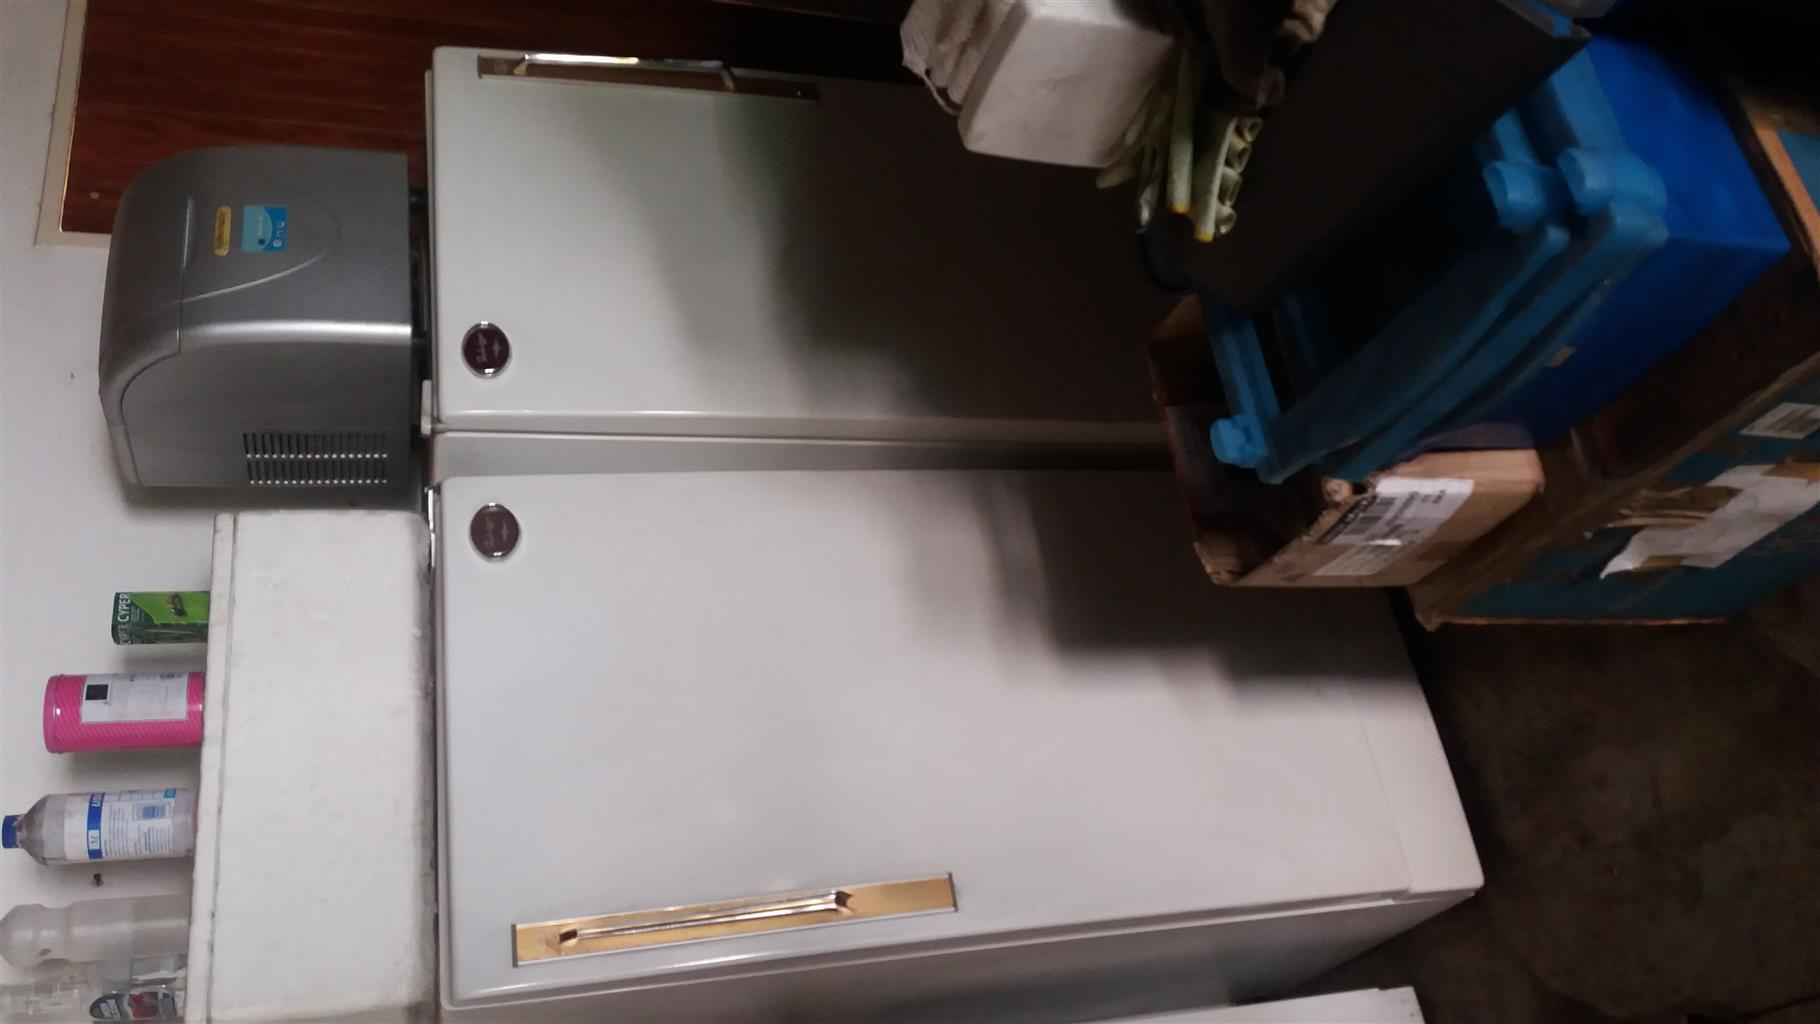 Fuch ware fridge and freezer